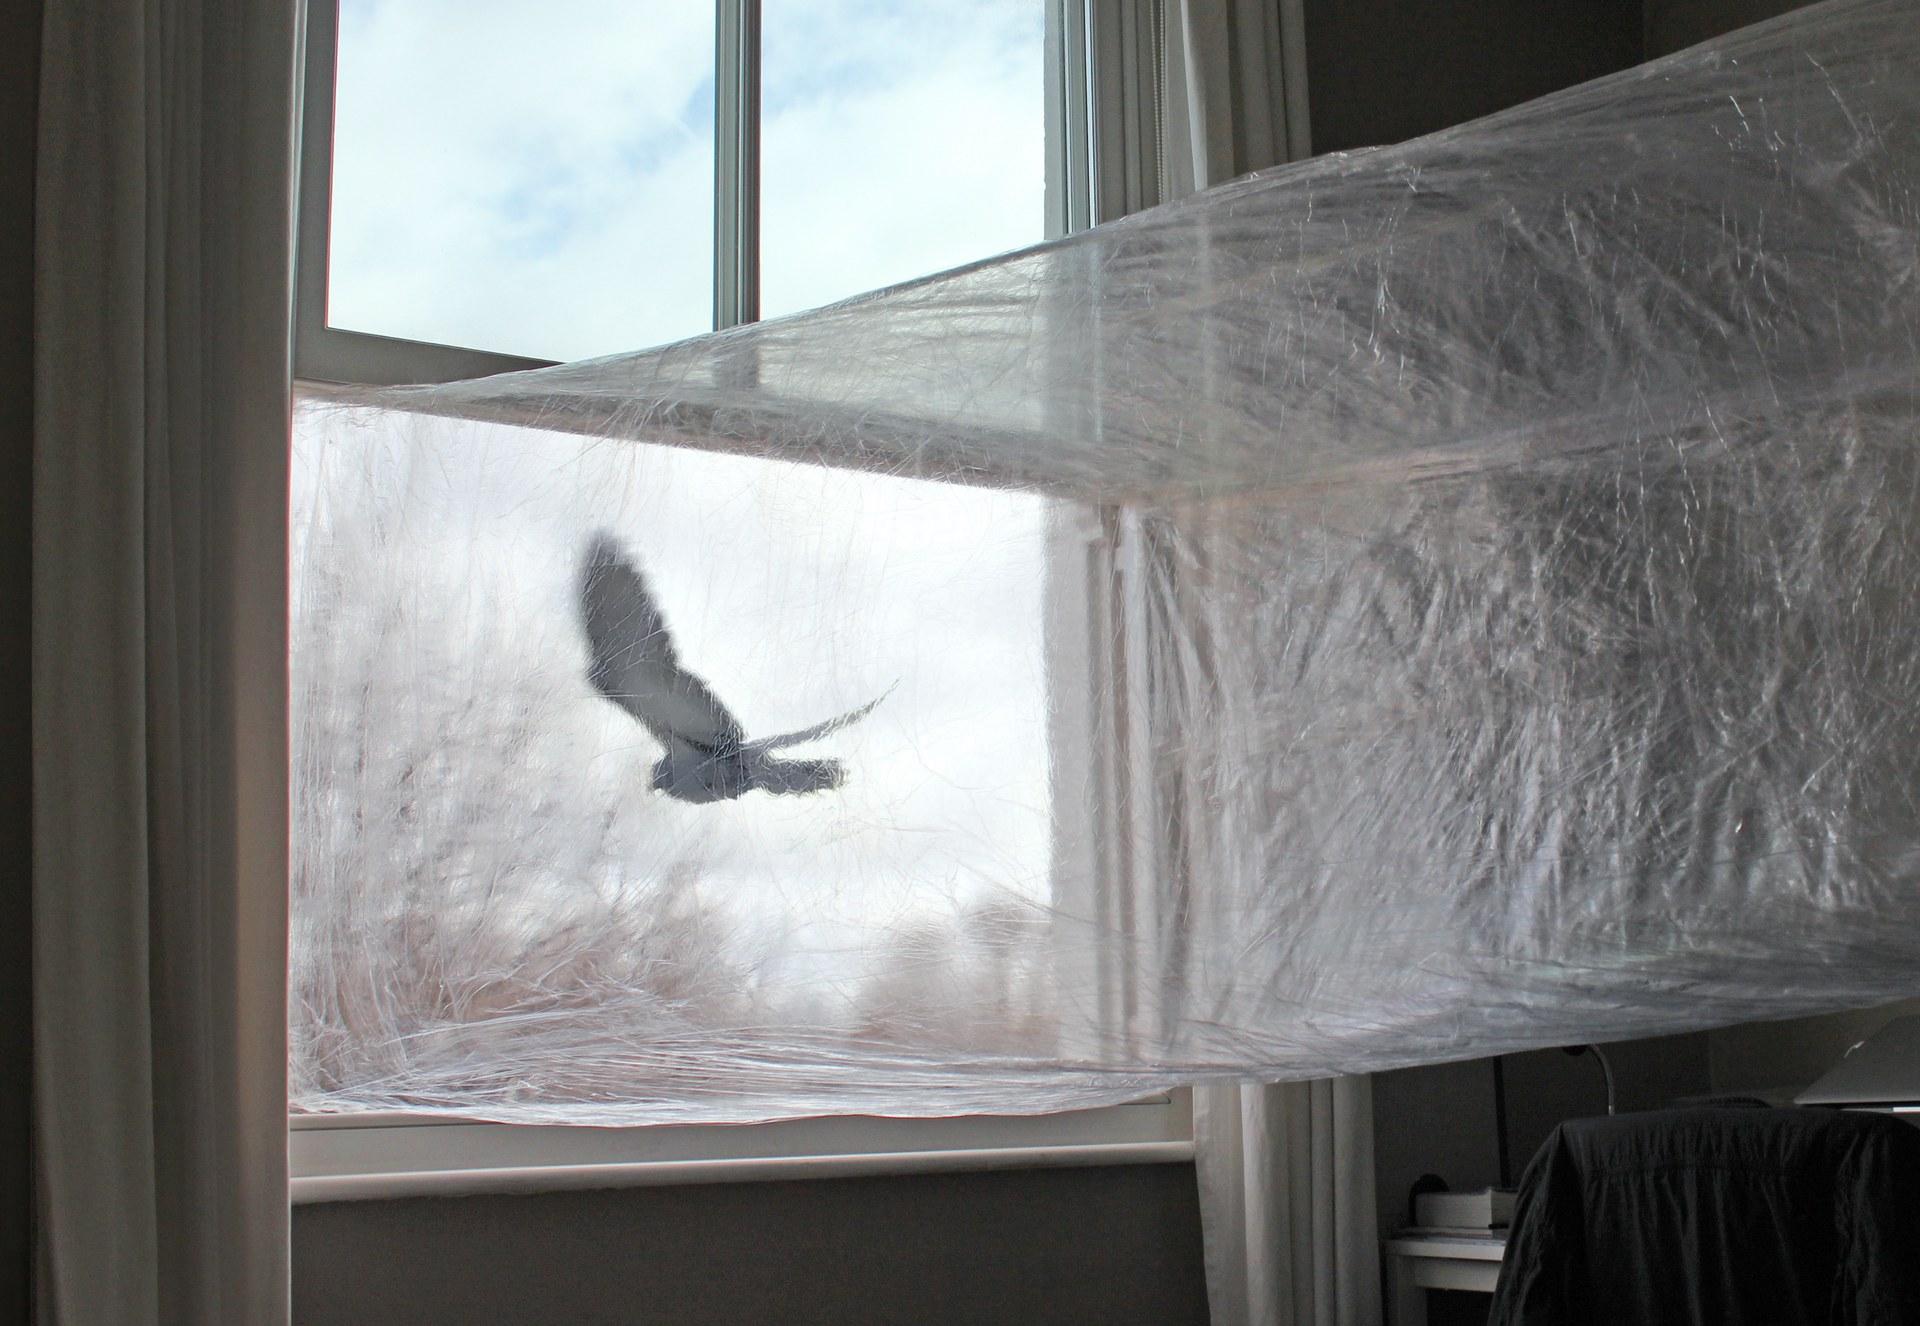 pigeon | 07:28 pm, 23 April | bridge II